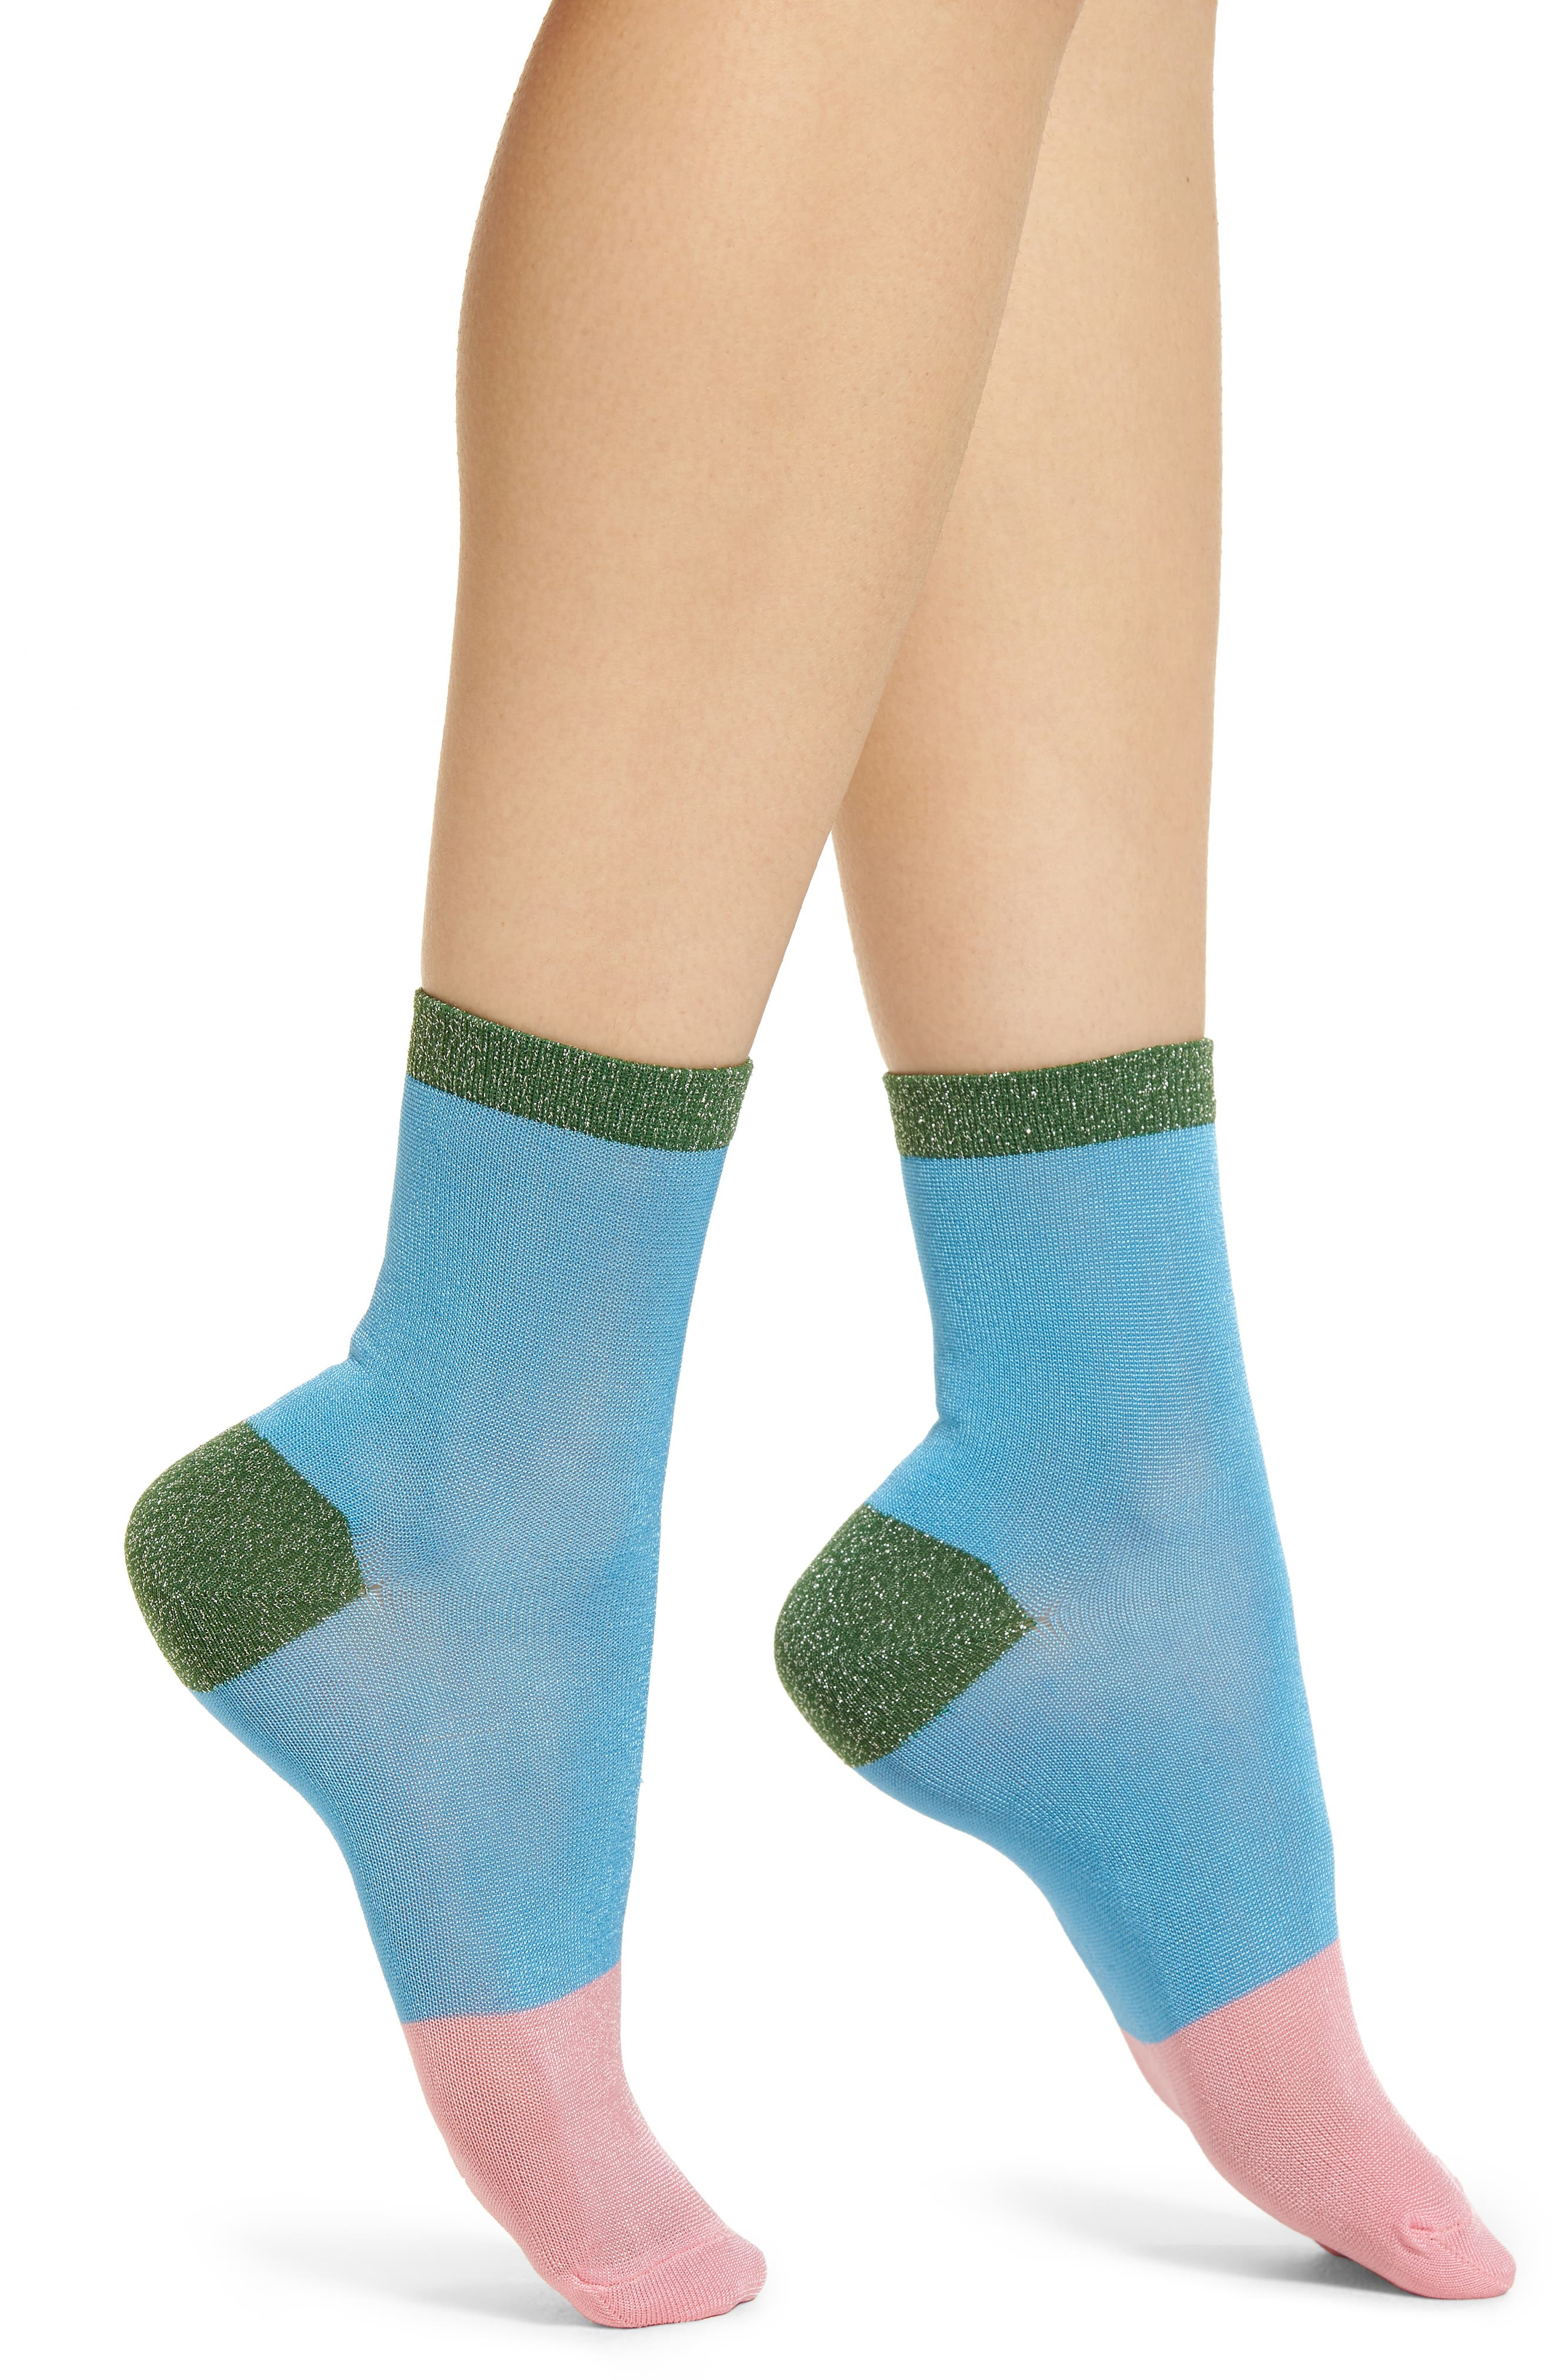 Main Image - Hysteria by Happy Socks Liza Sparkle Ankle Socks